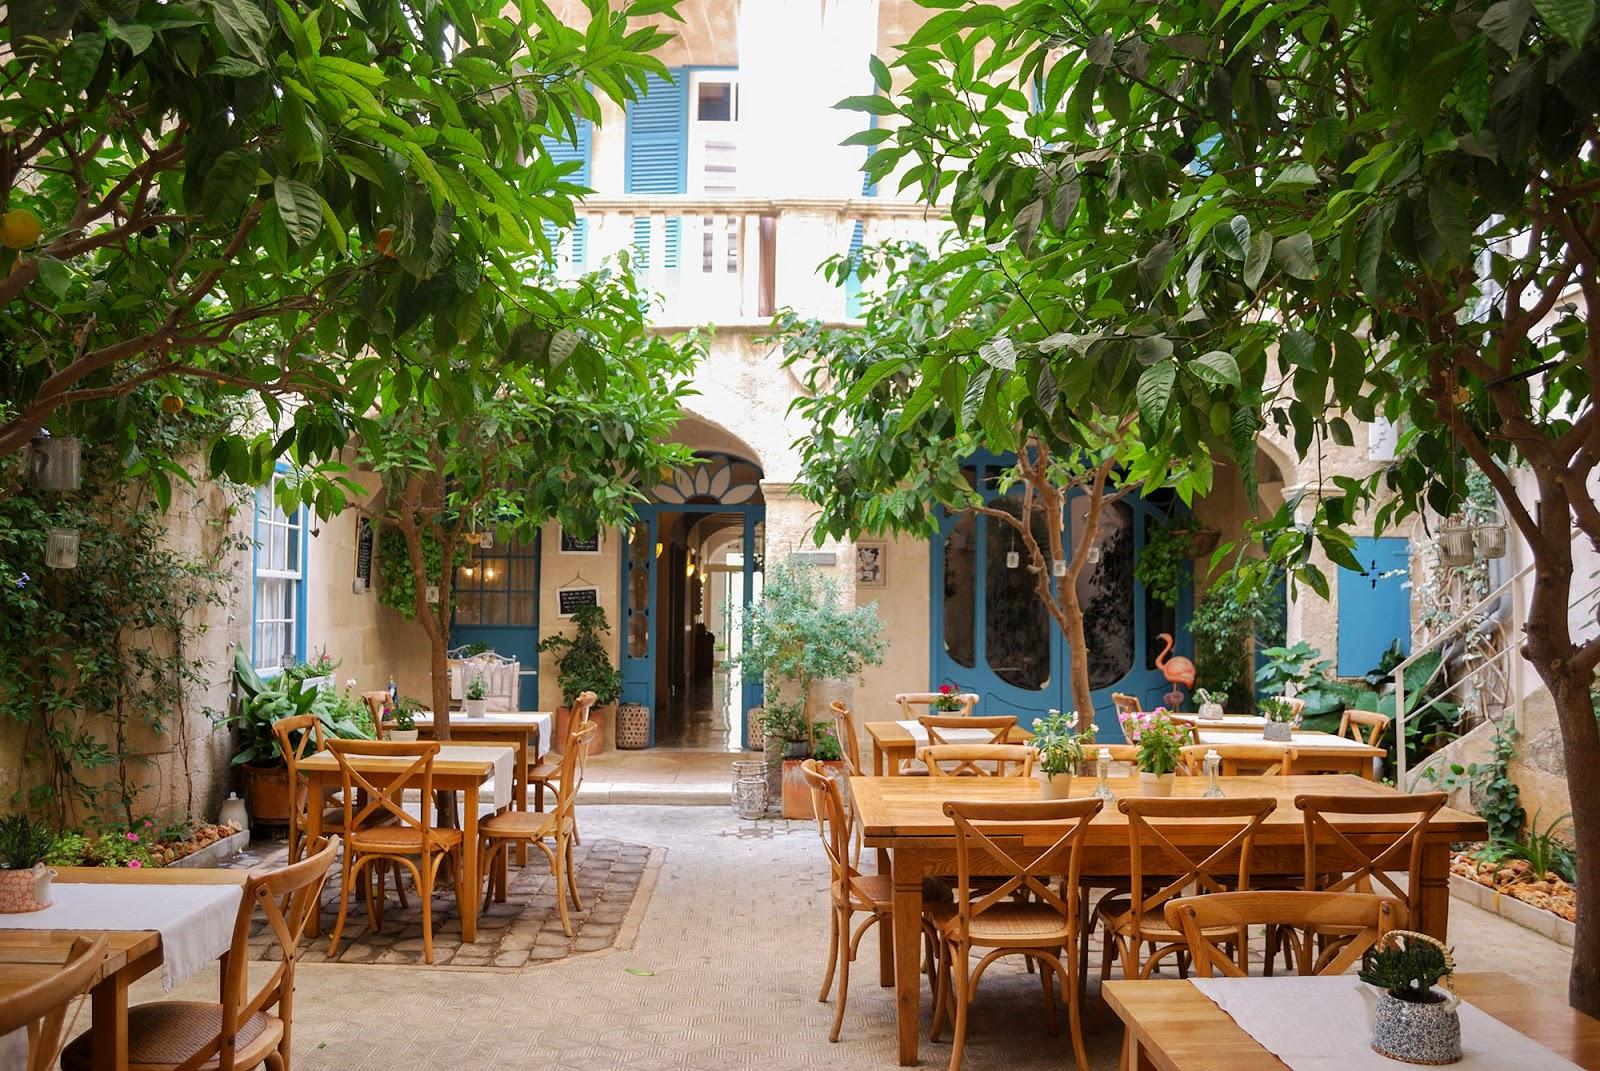 Jardi de ses Bruixes Mahon Menorca Spain where to eat stay boutique hotel